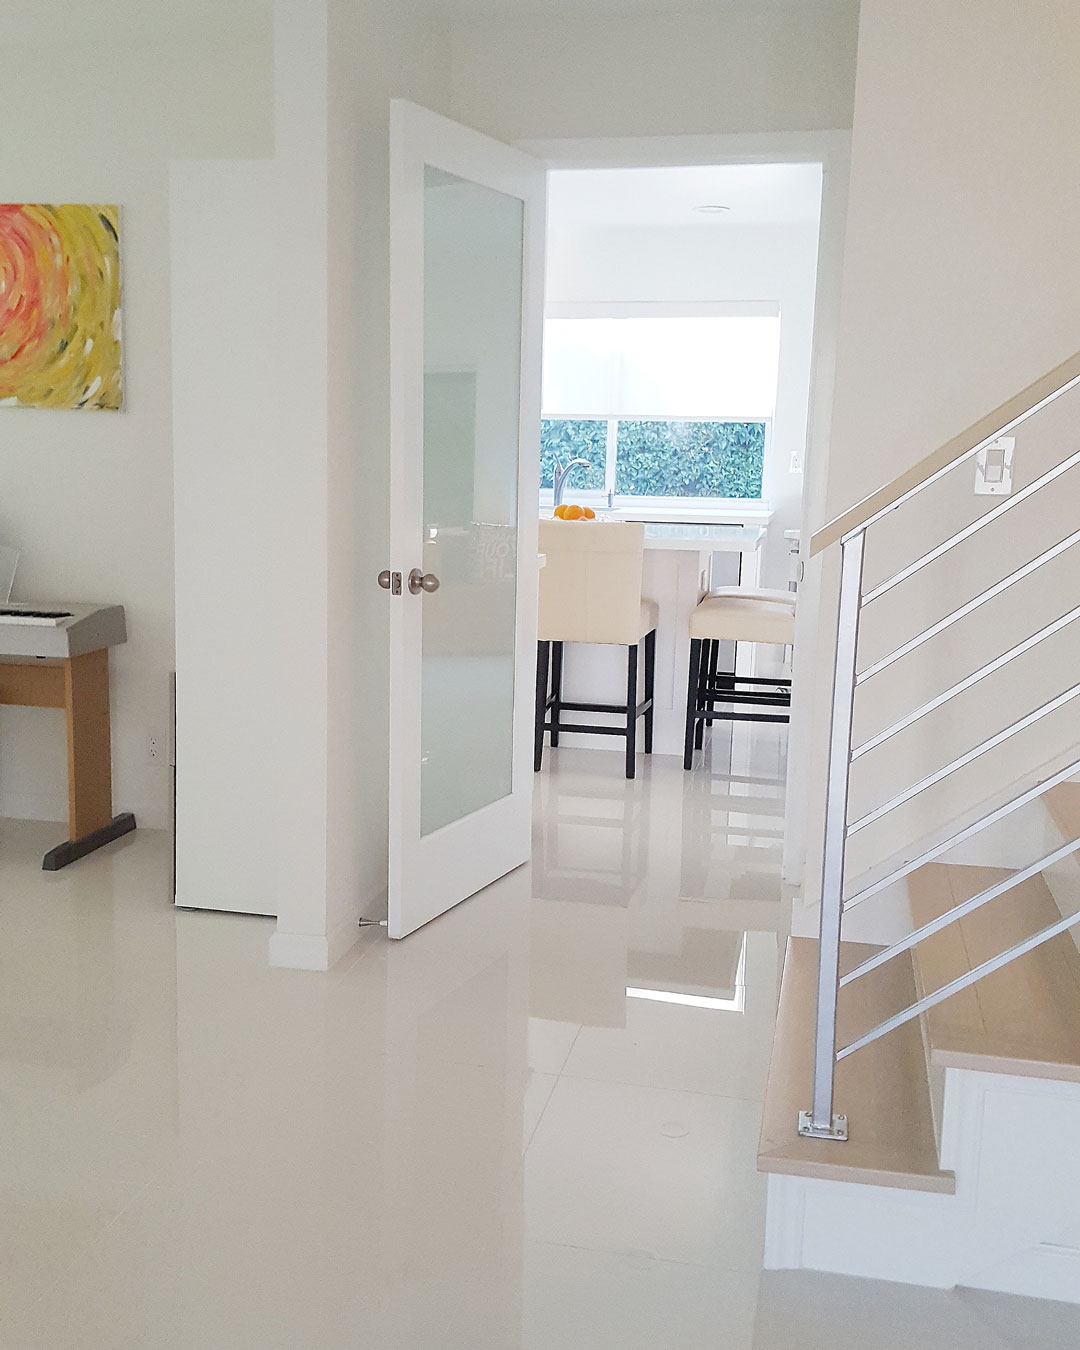 Full House Remodel in East Bay California